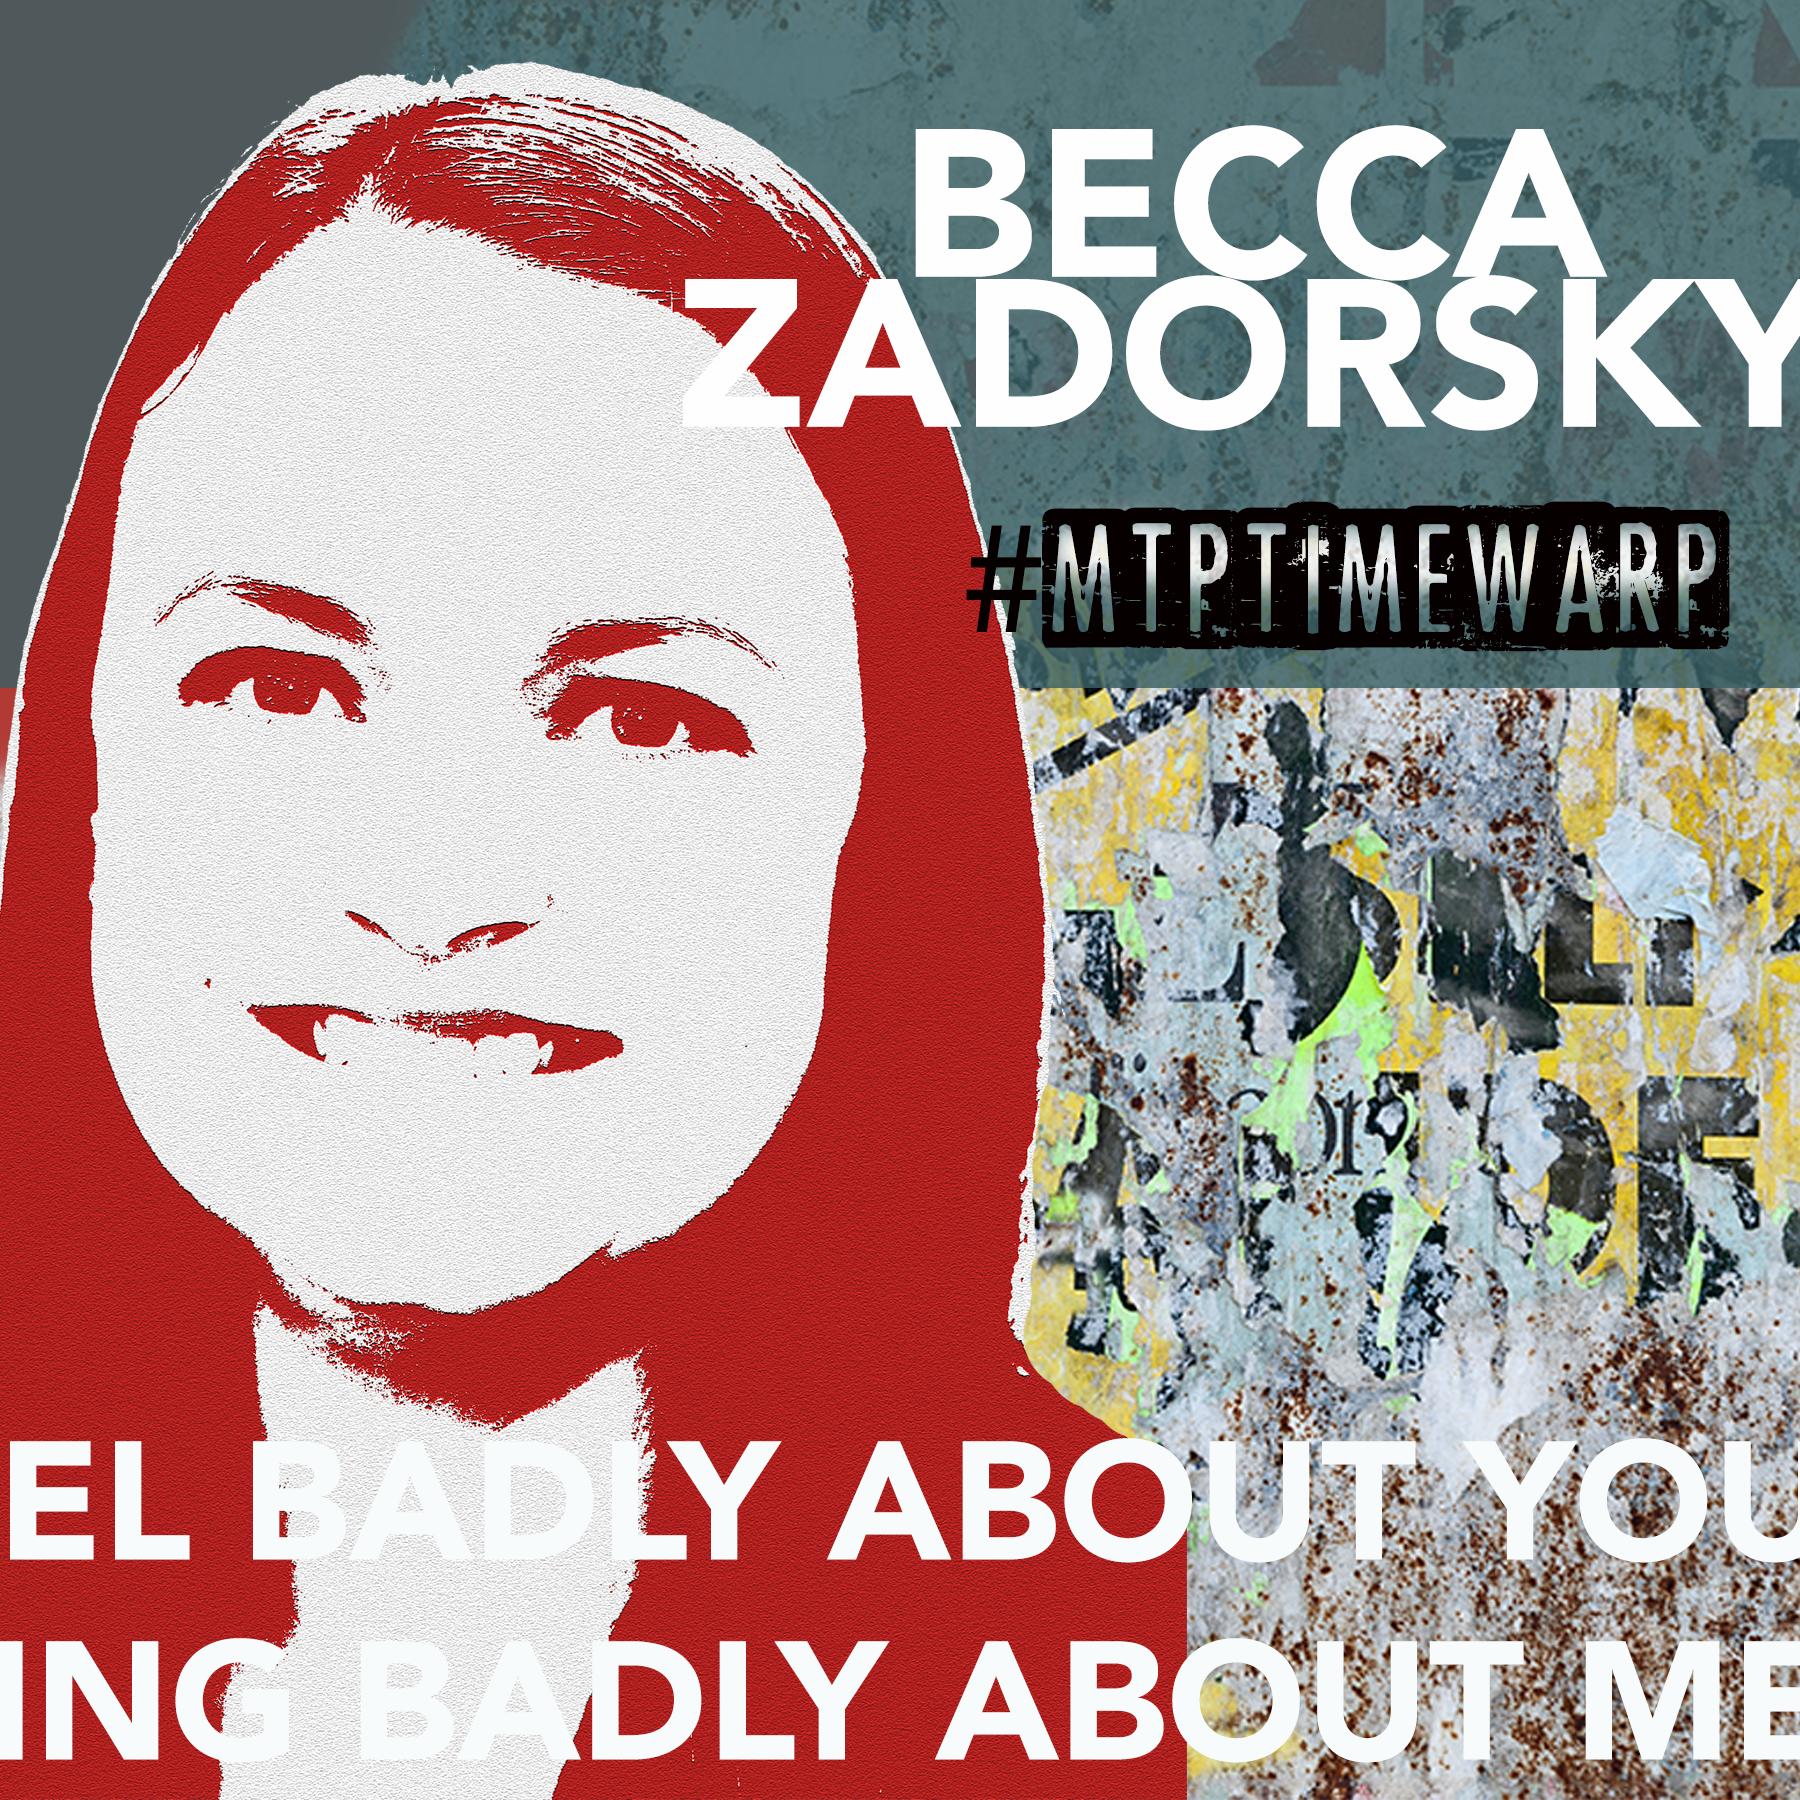 Becca Zadorsky Headshot.png